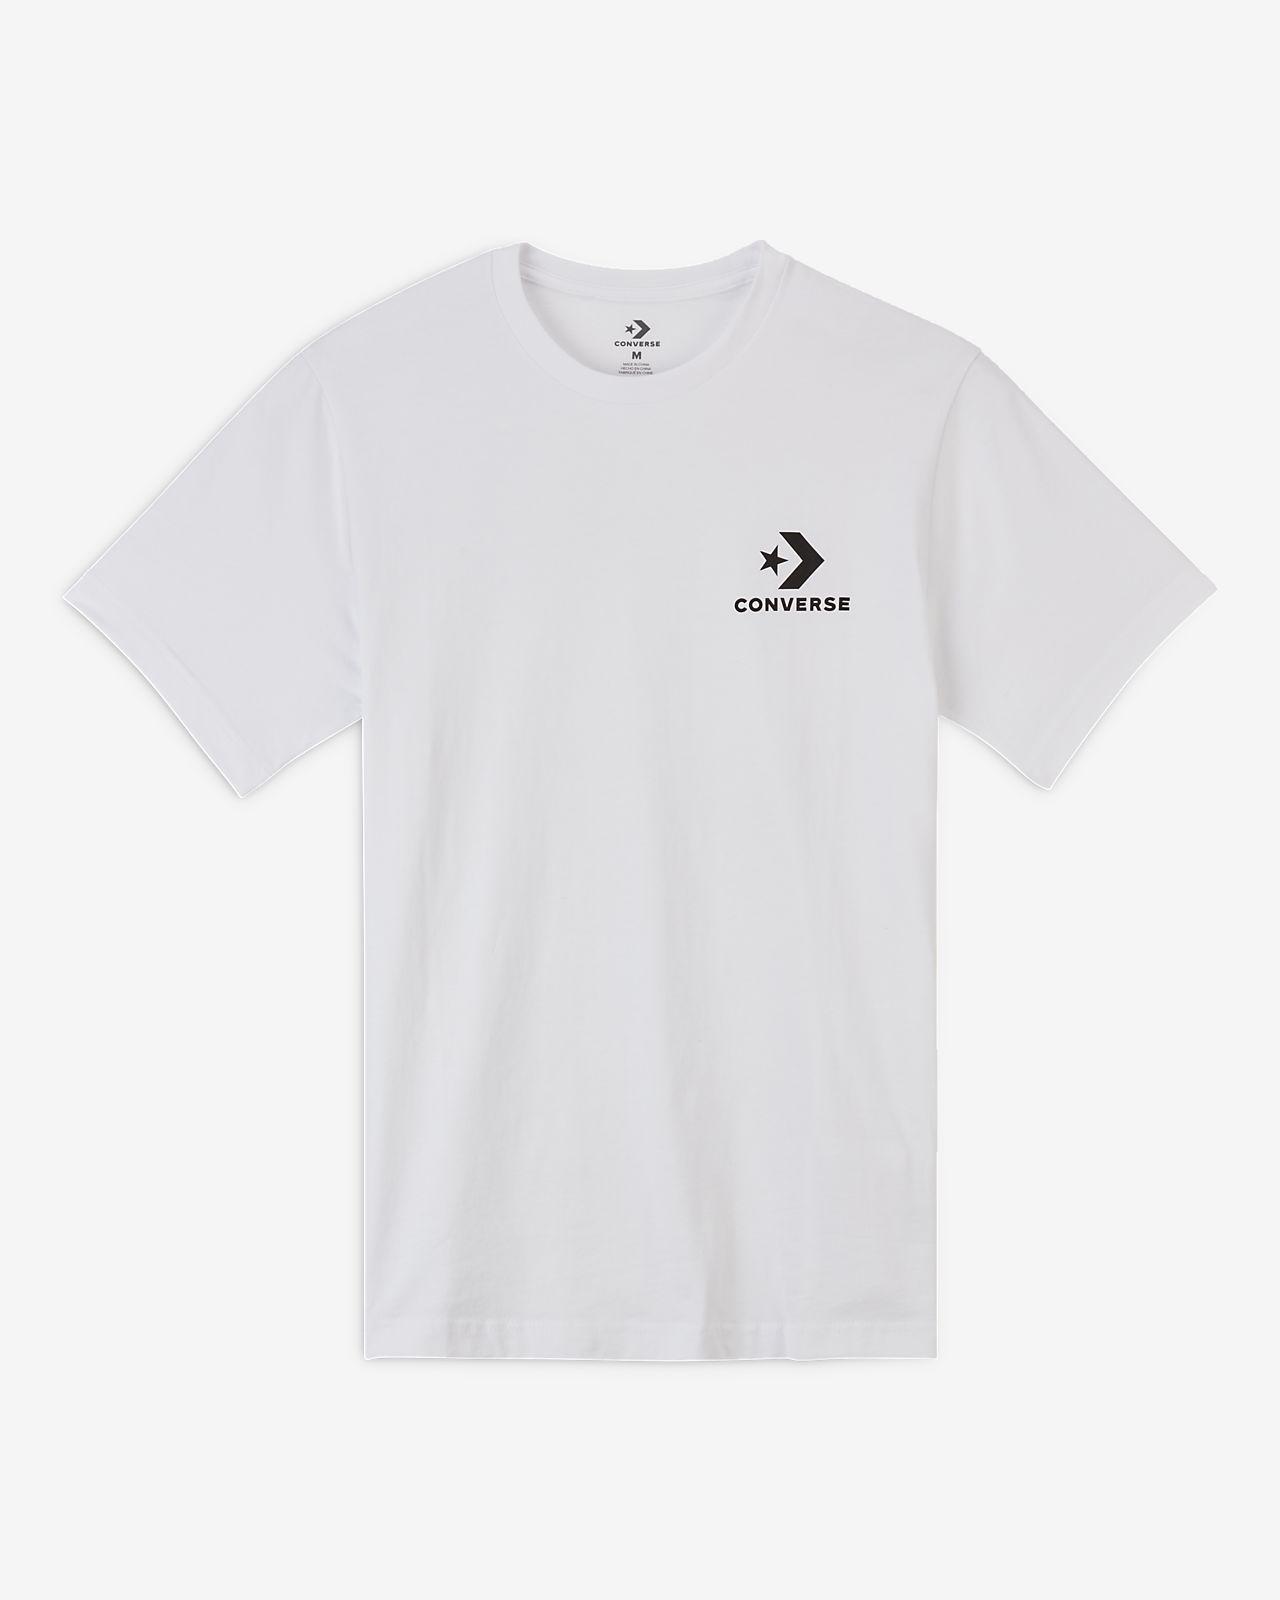 Converse Left Chest Star Chevron Men's T-Shirt